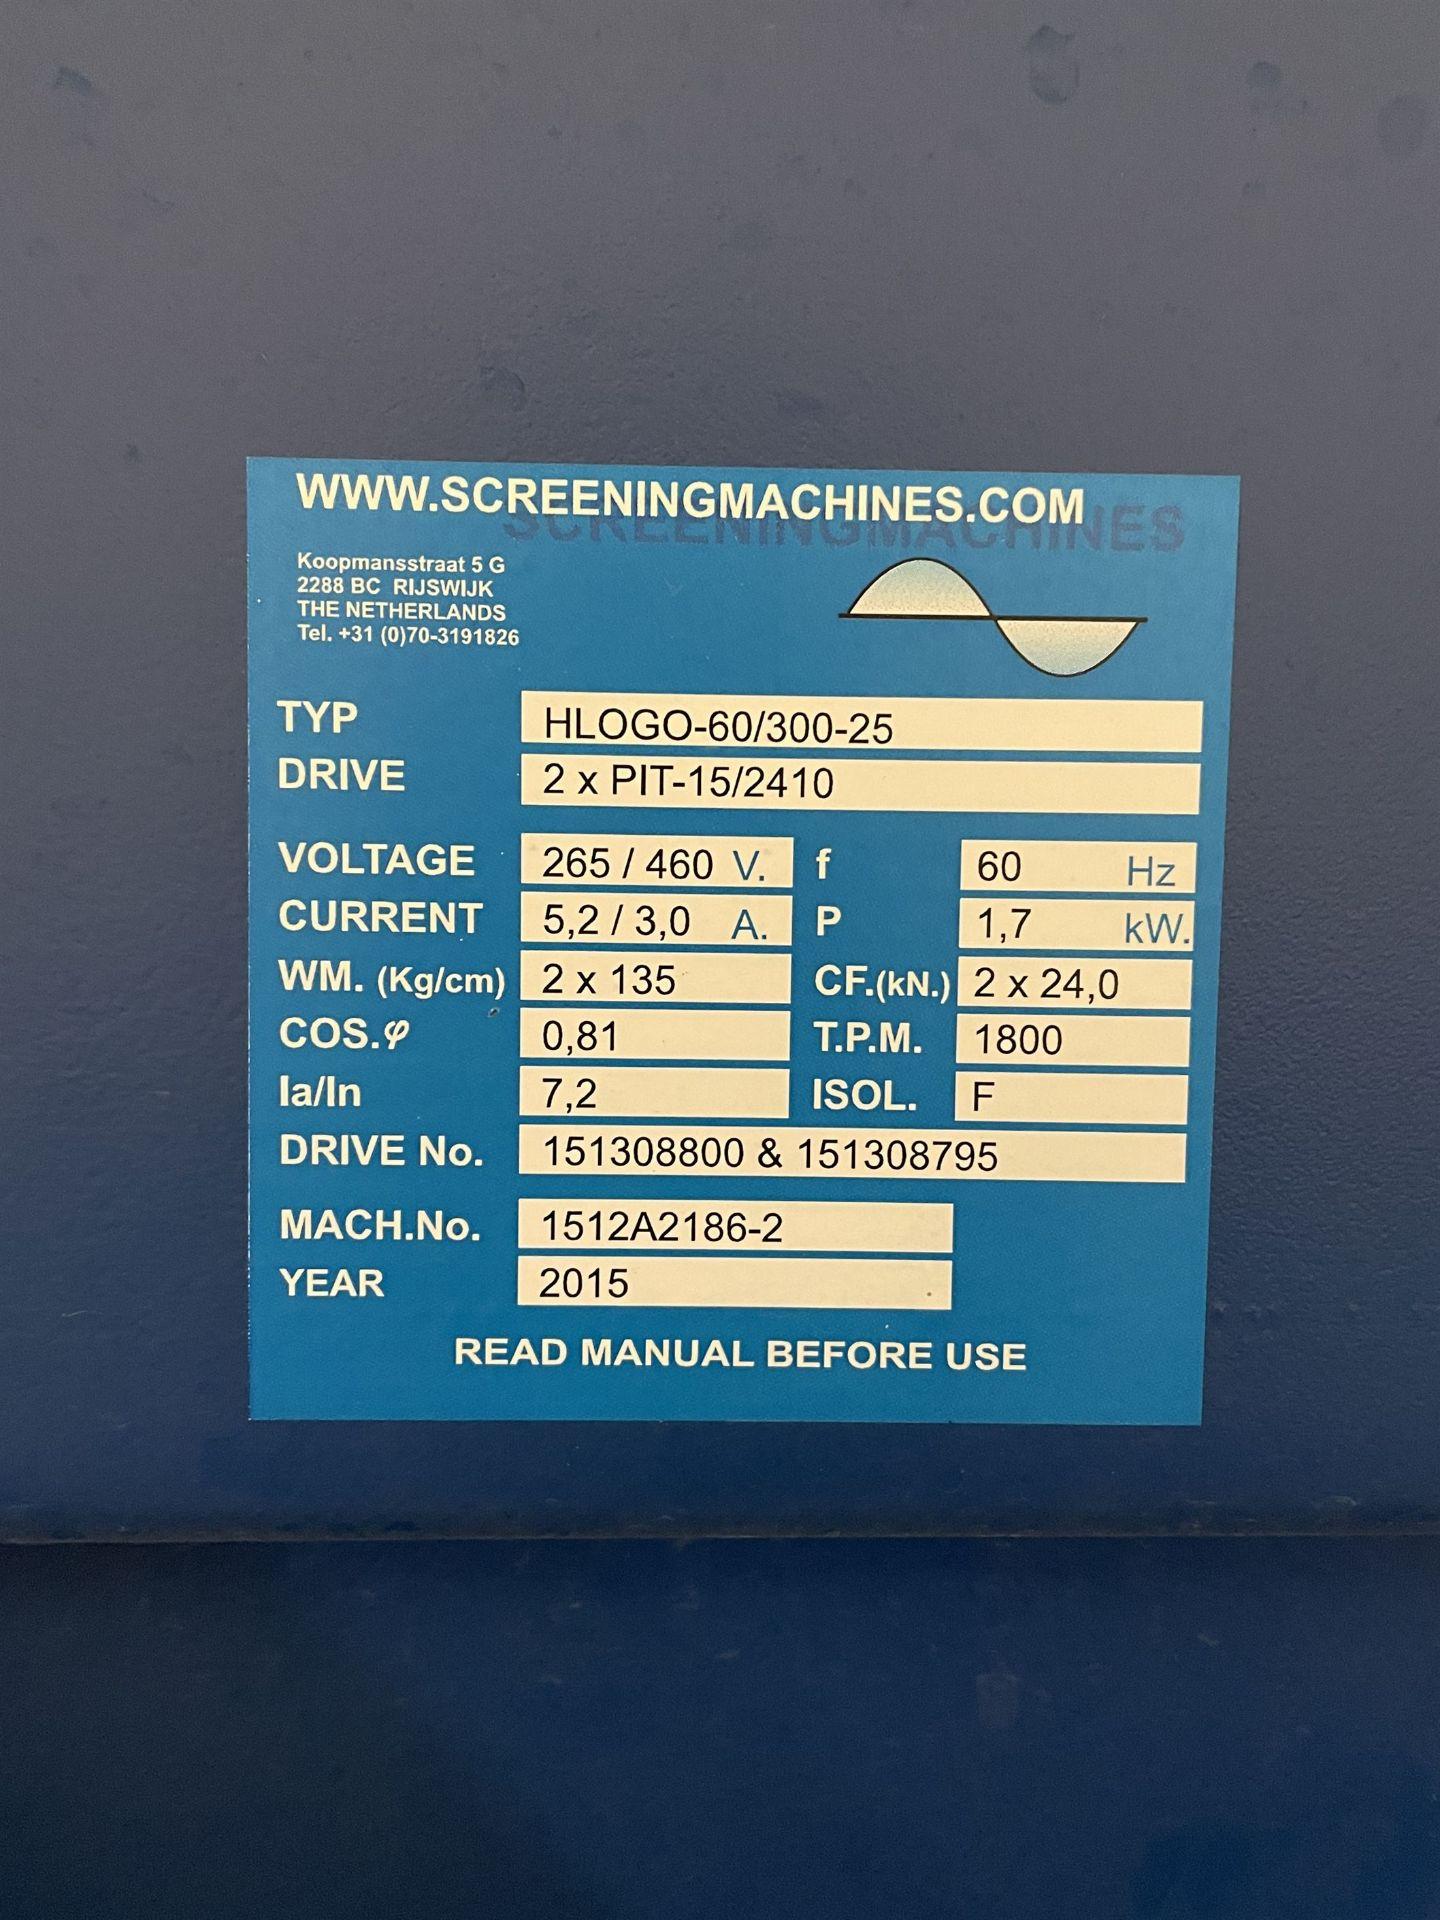 2015 SCREENING MACHINES HLOGO-60/300-25 Shaker Screen, s/n 1512A2186-2, 600 x 3000 x 250mm - Image 6 of 10